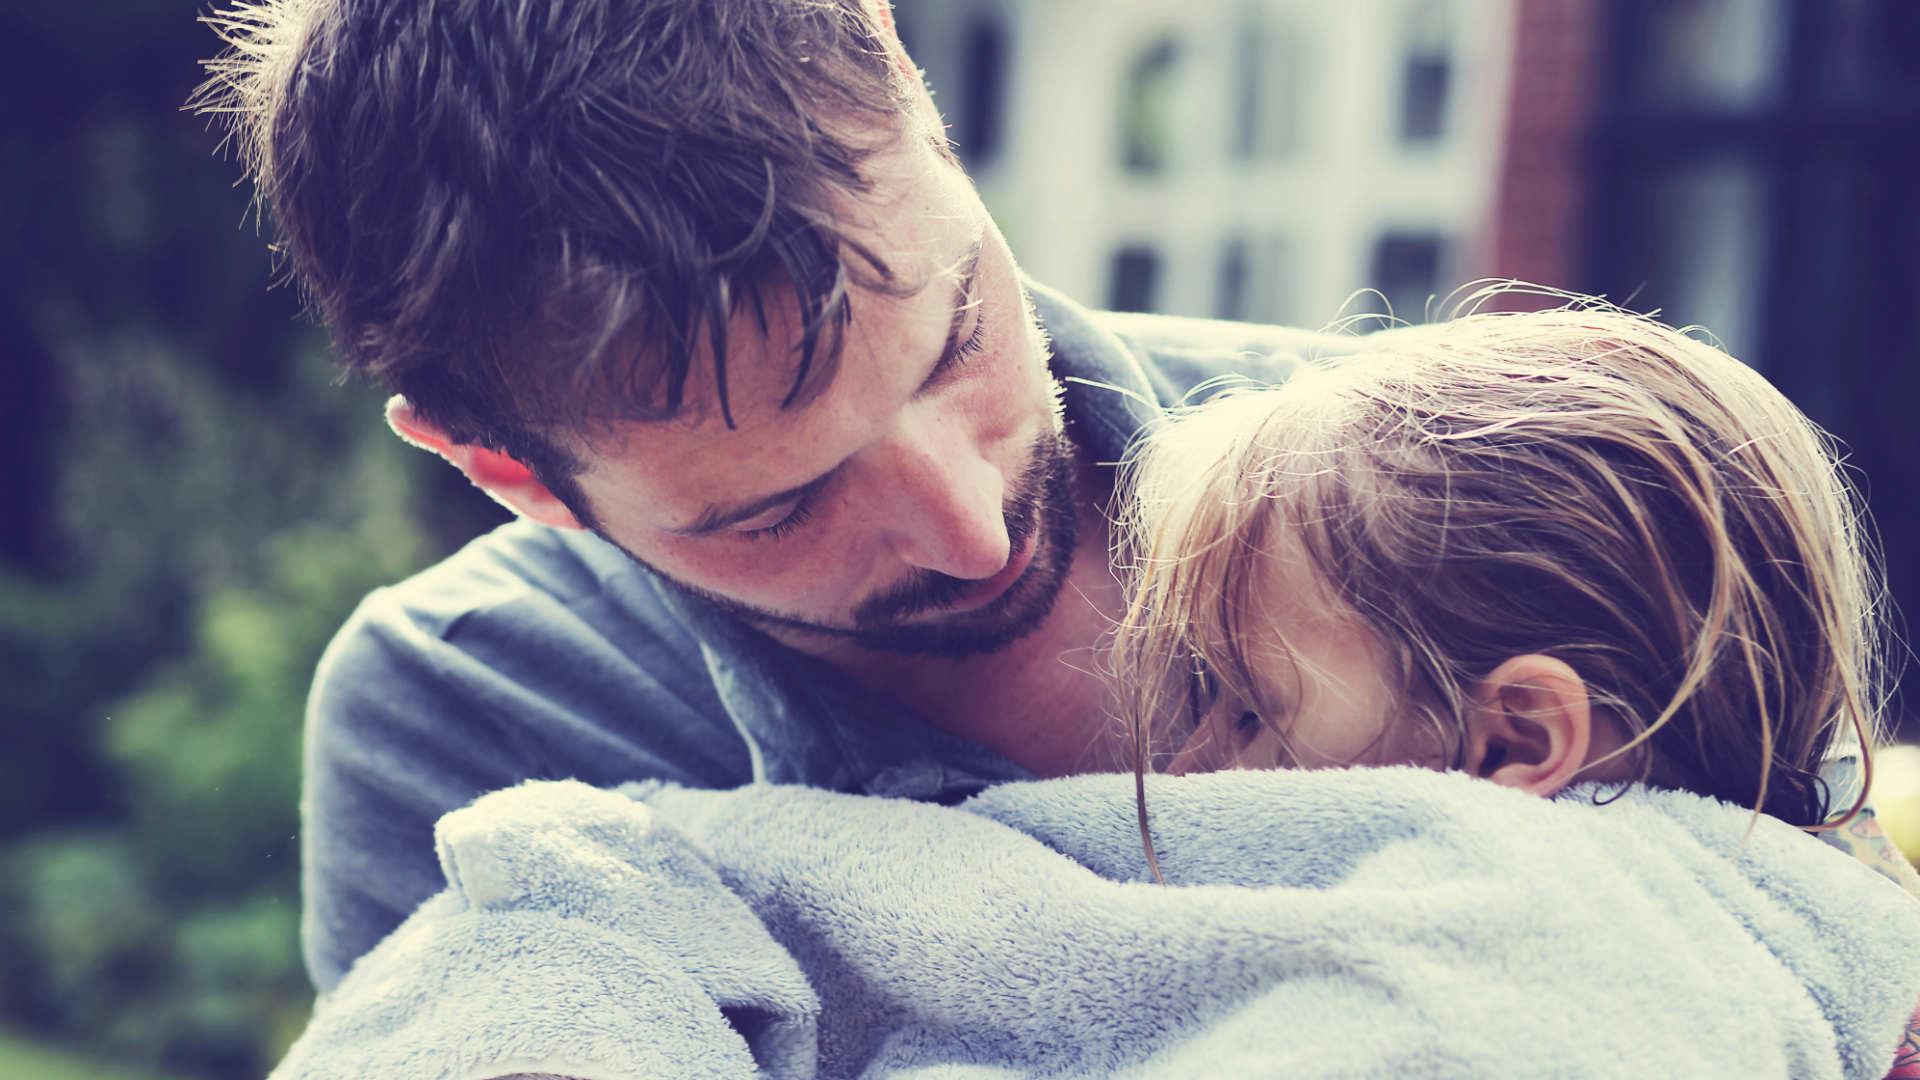 Top 3 Child Custody Tips | MacLean Family Law